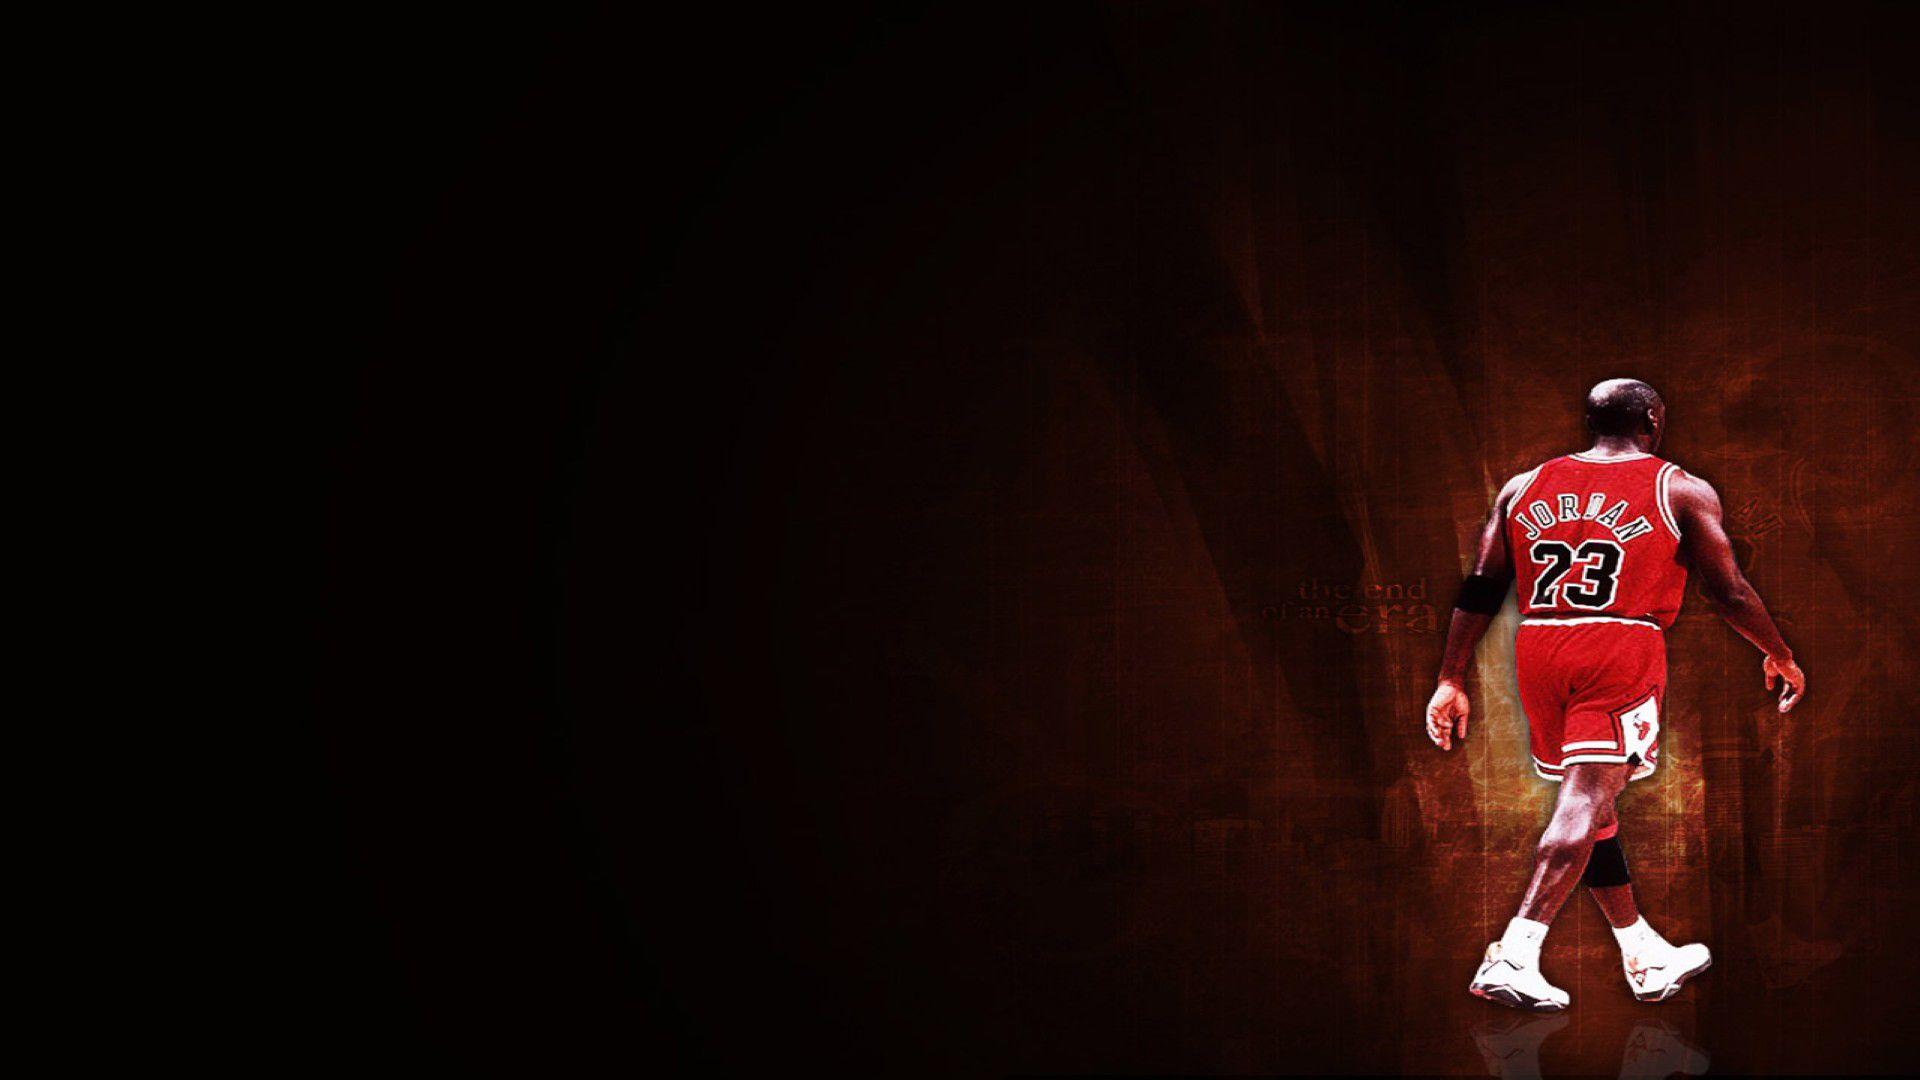 Michael Jordan Backgrounds Desktop Wallpaper Box